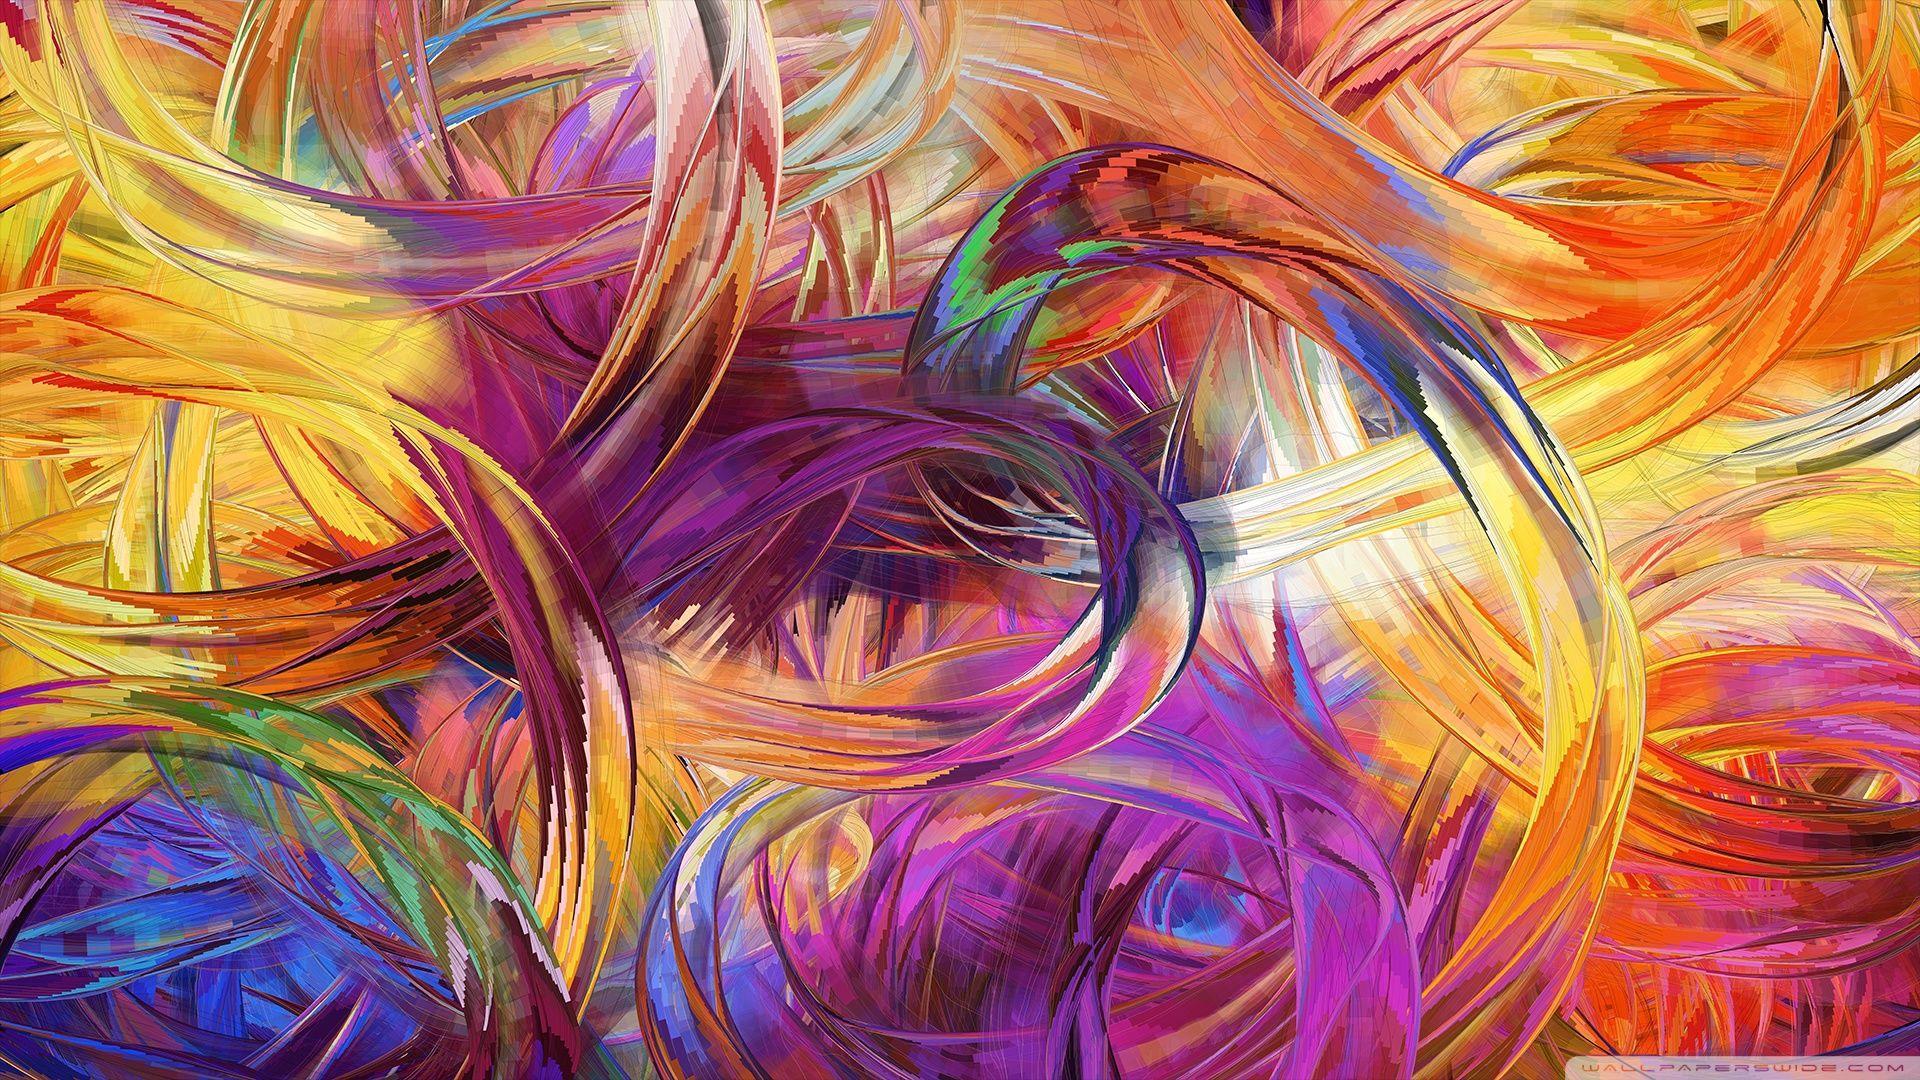 Paint Art Wallpapers Top Free Paint Art Backgrounds Wallpaperaccess